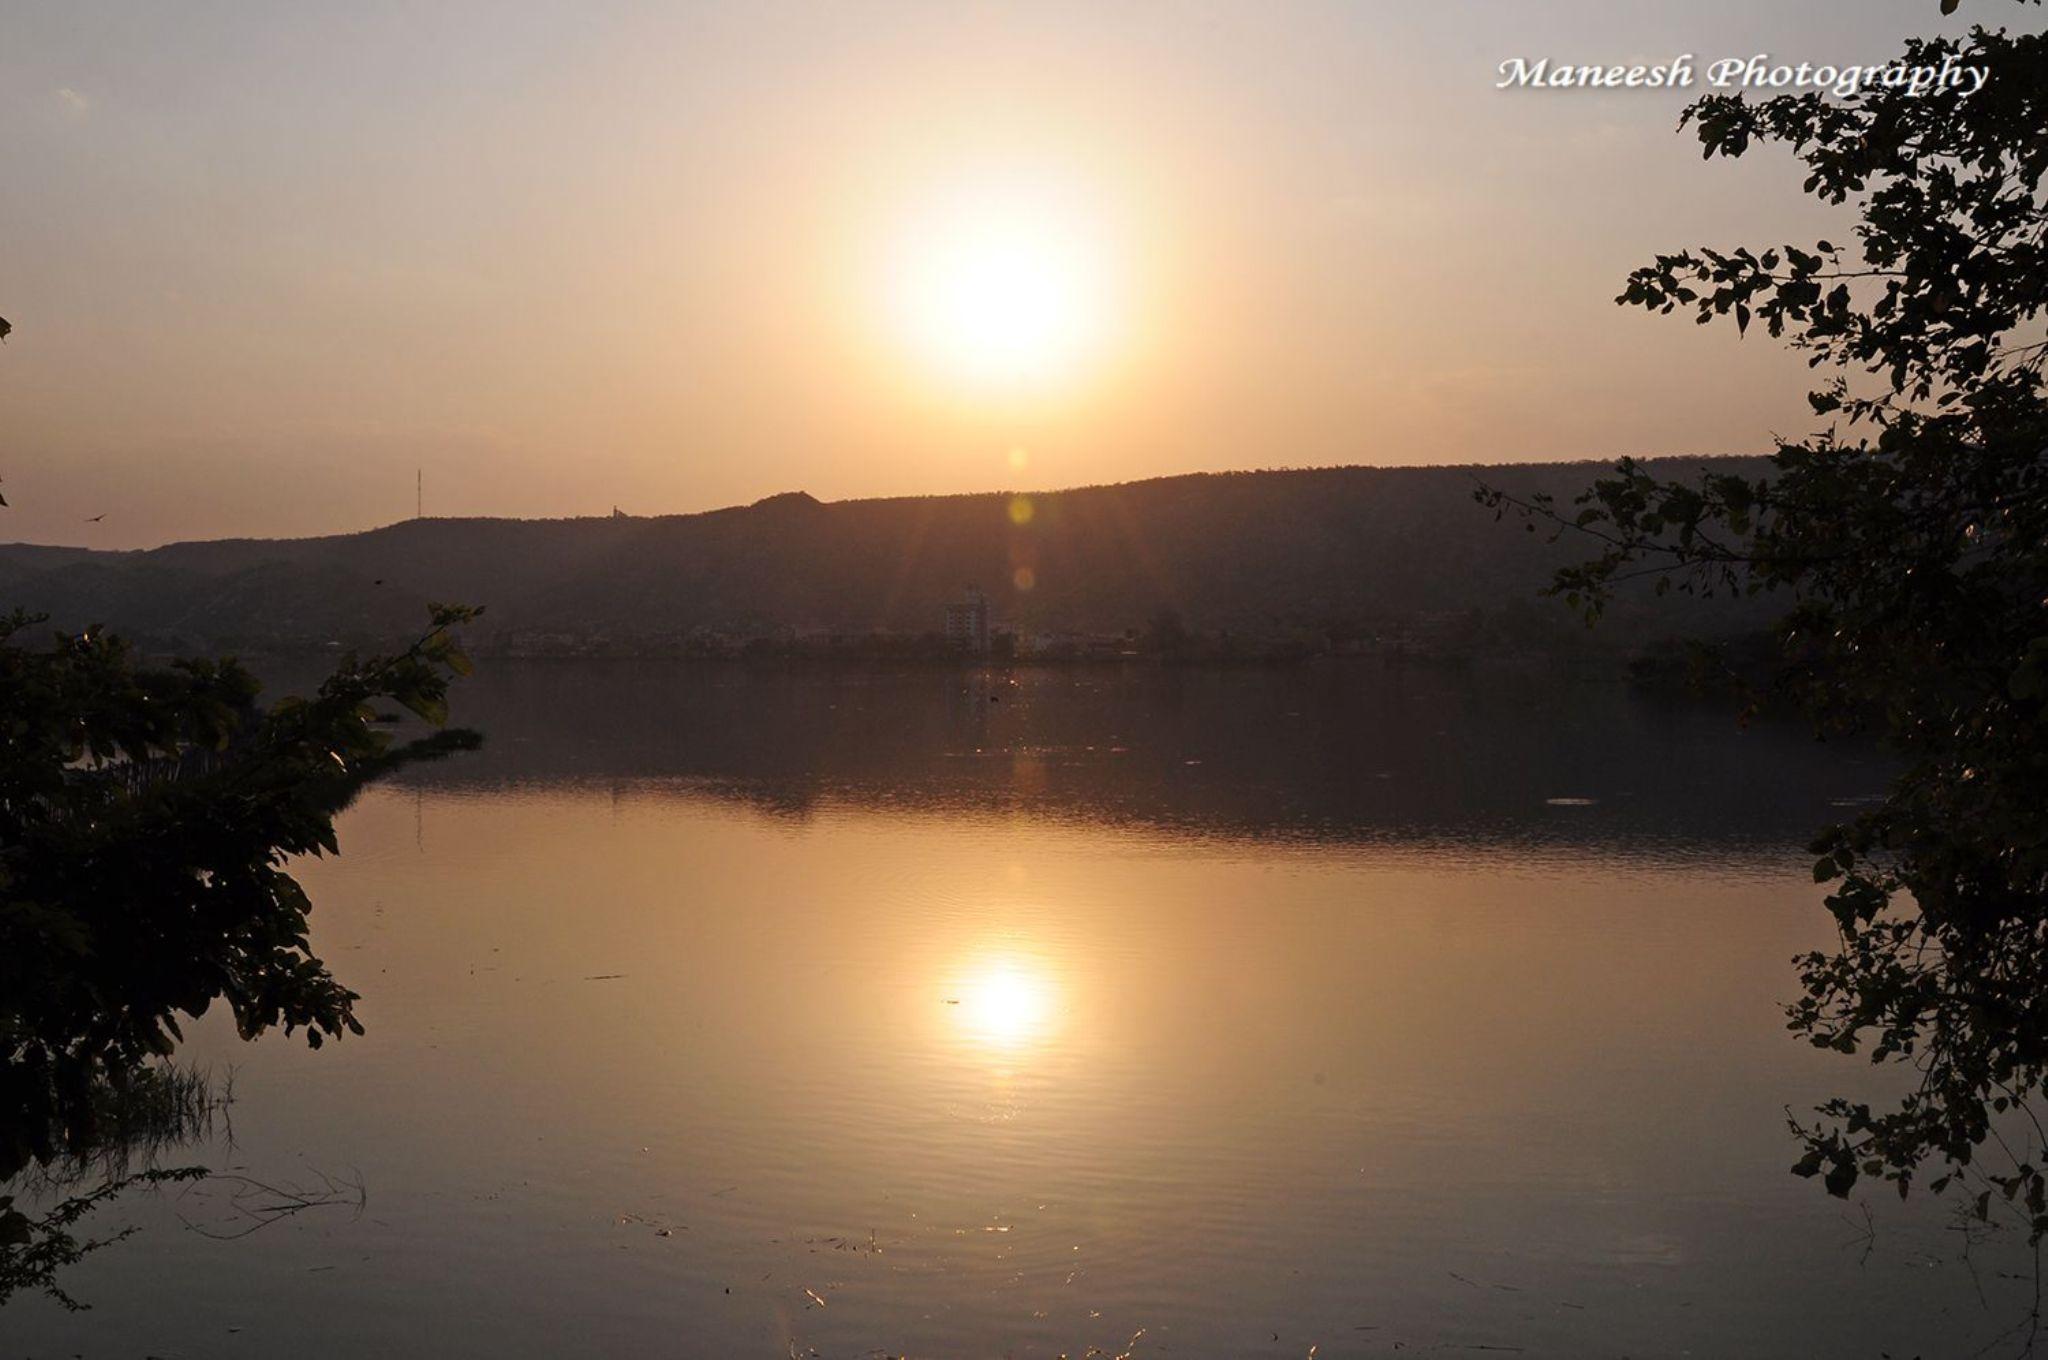 Sun Reflect in Man Sagar Lake PINK City Jaipur  by Maneesh Sharma